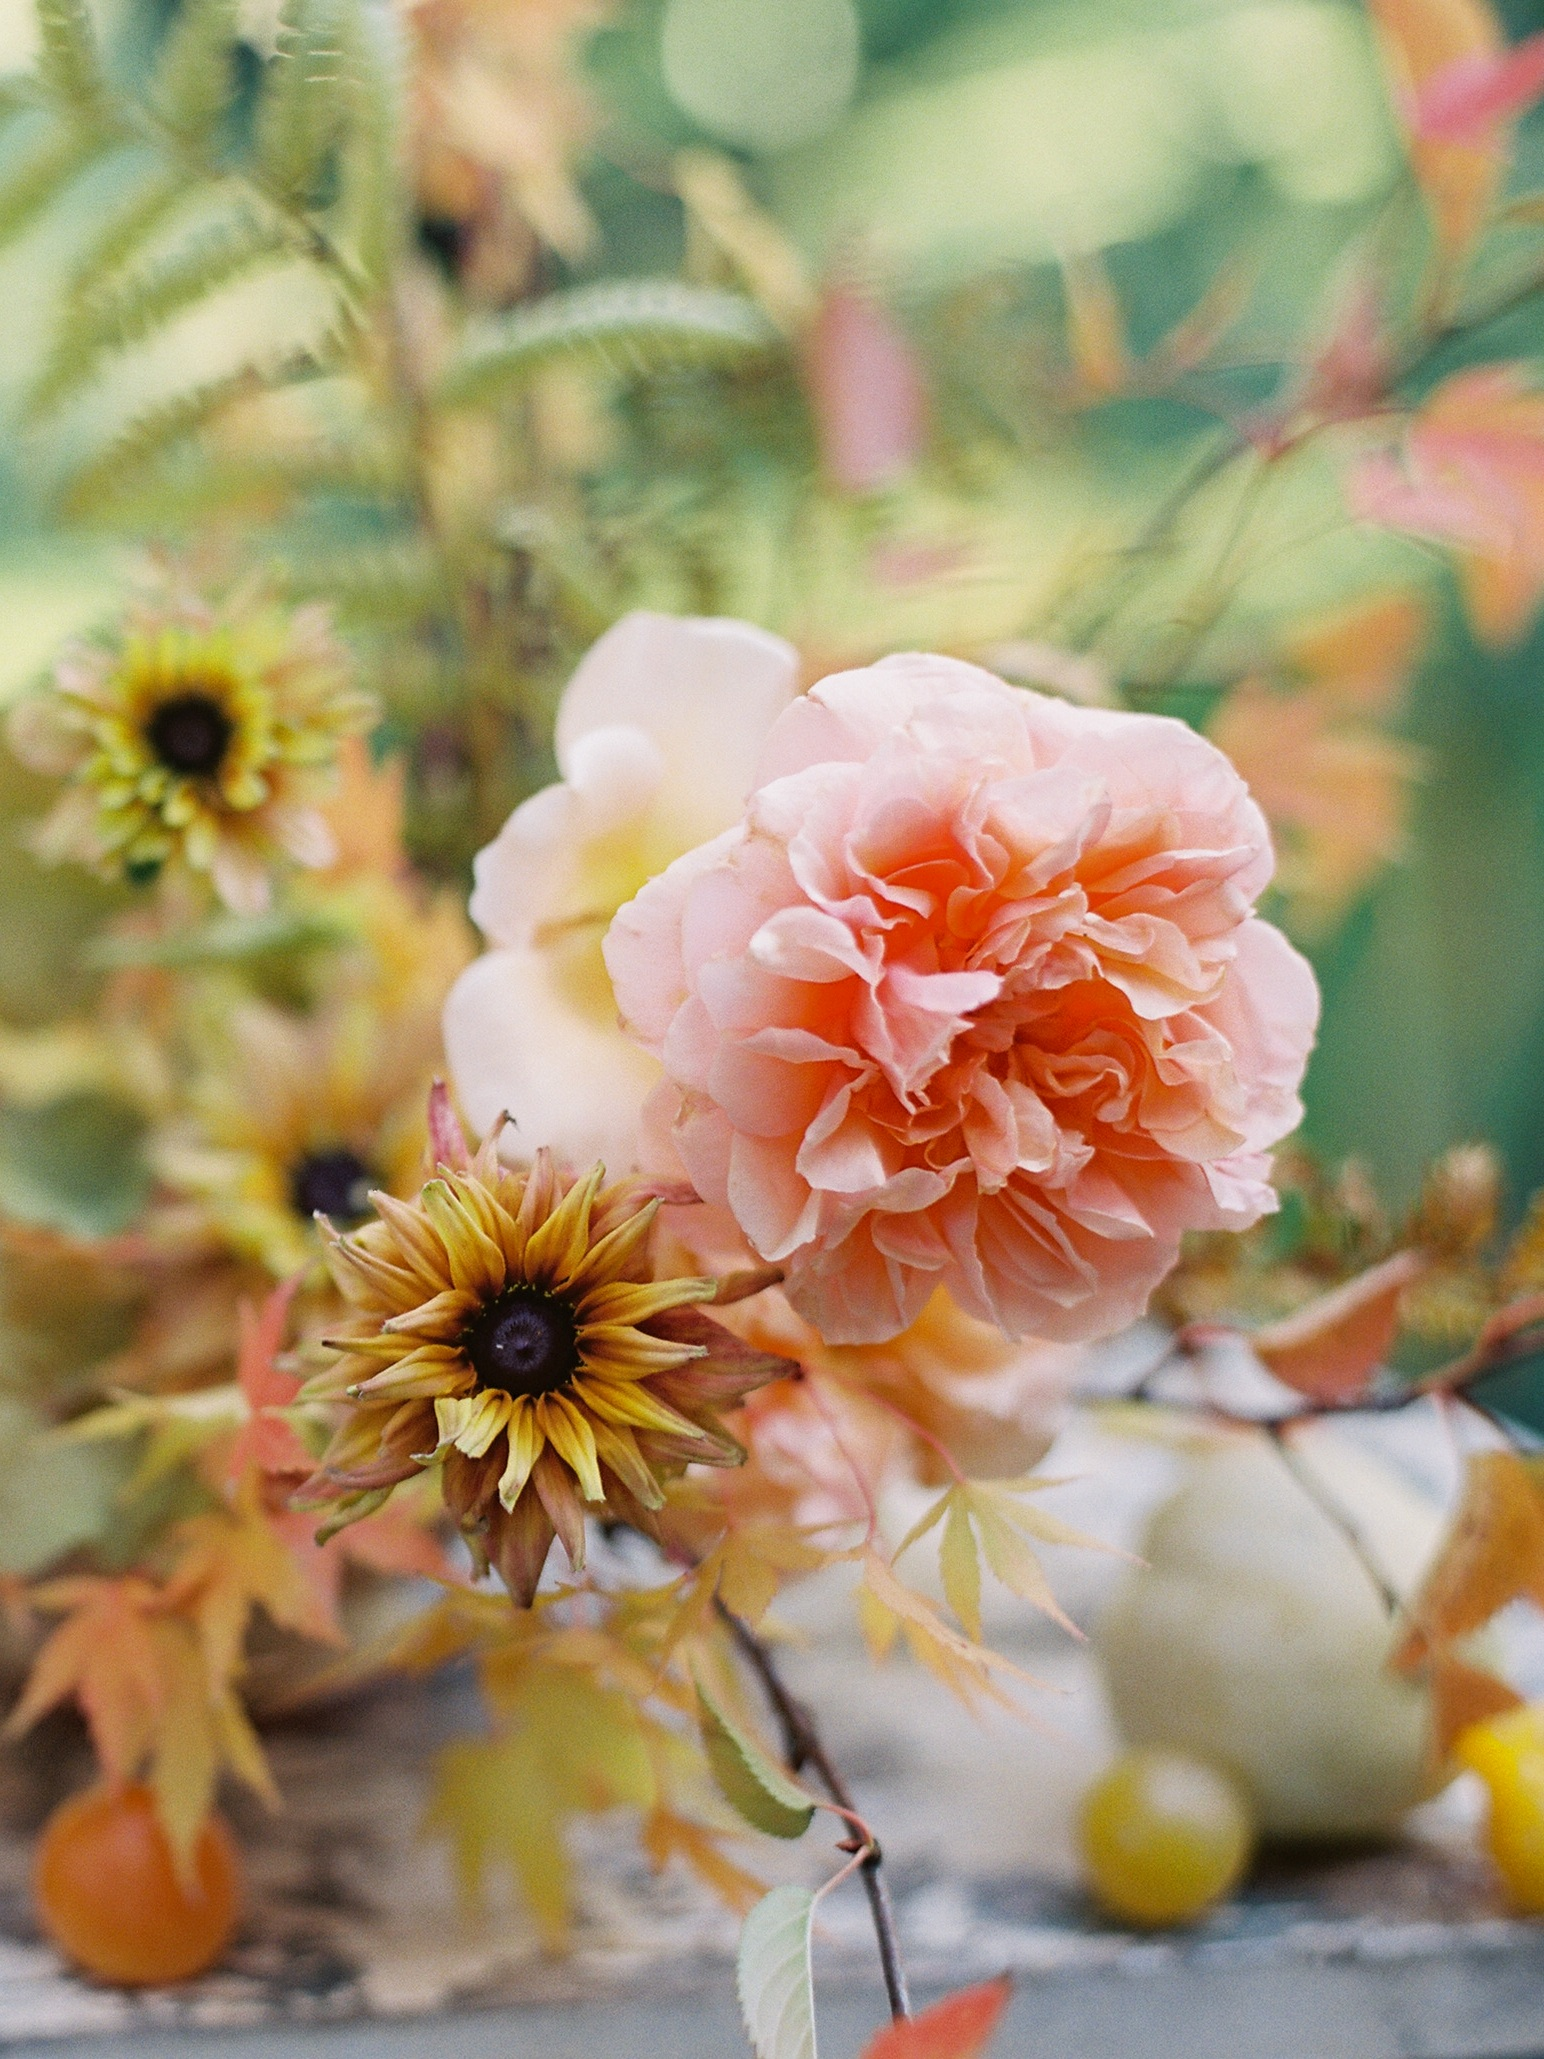 alice beasley flowers spring wedding centrepiece rose wedding flowers